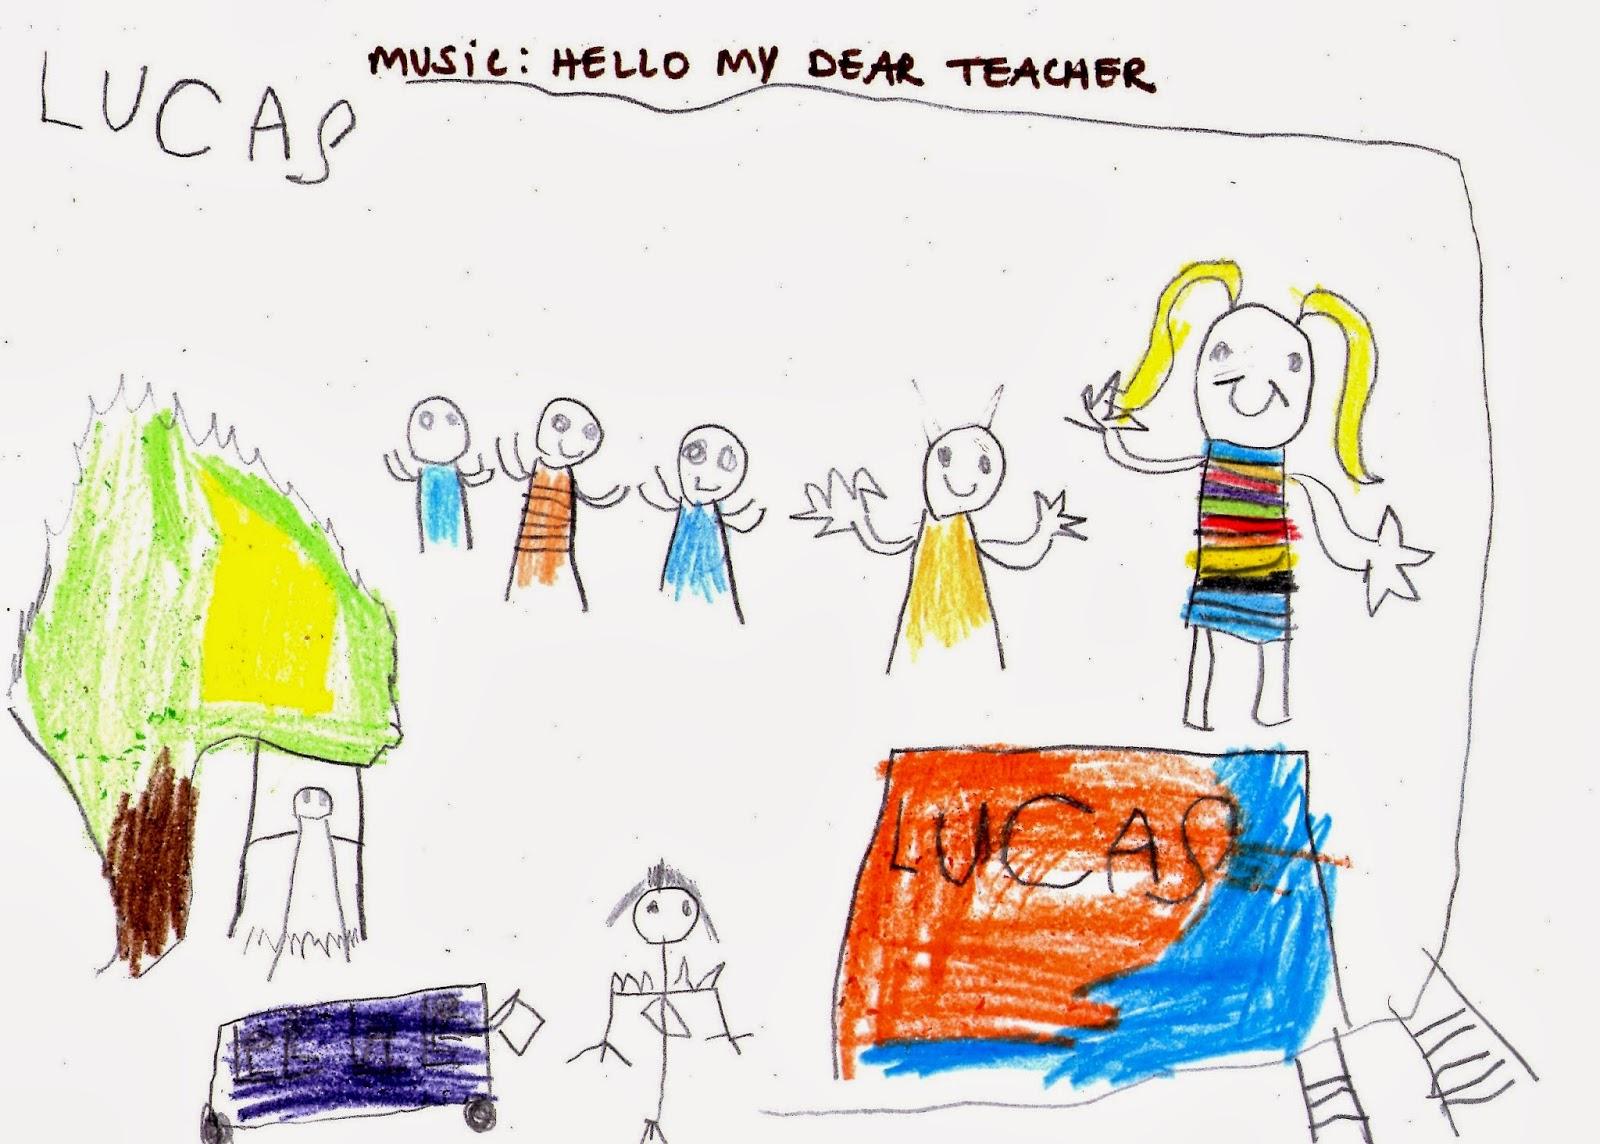 hello my dear teacher musica